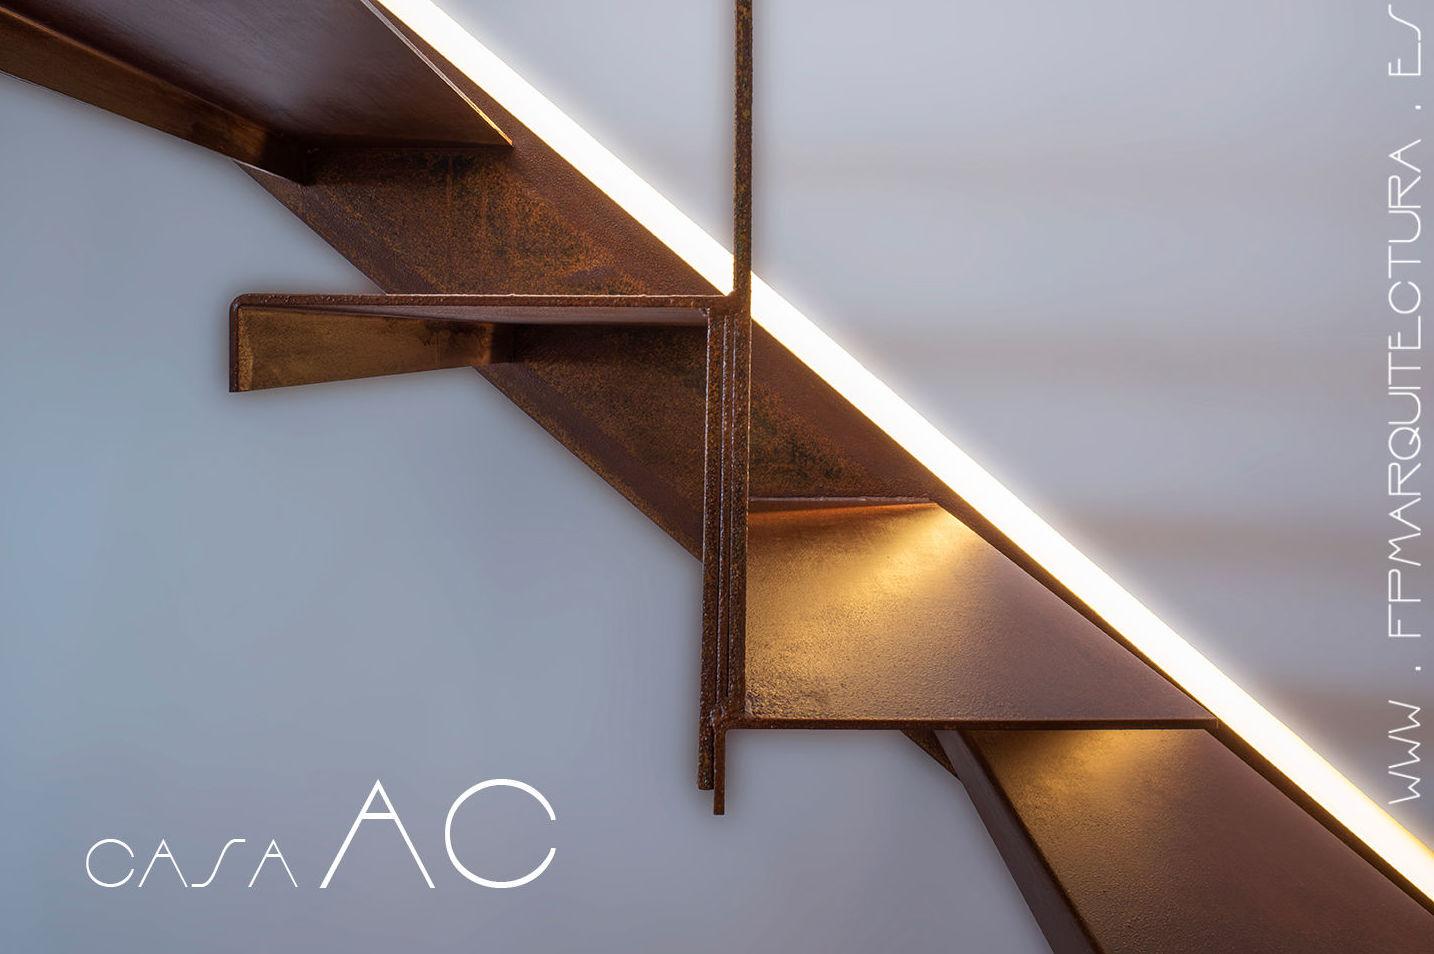 Casa AC    www.architectsitges.com: Proyectos  architectsitges.com de FPM Arquitectura